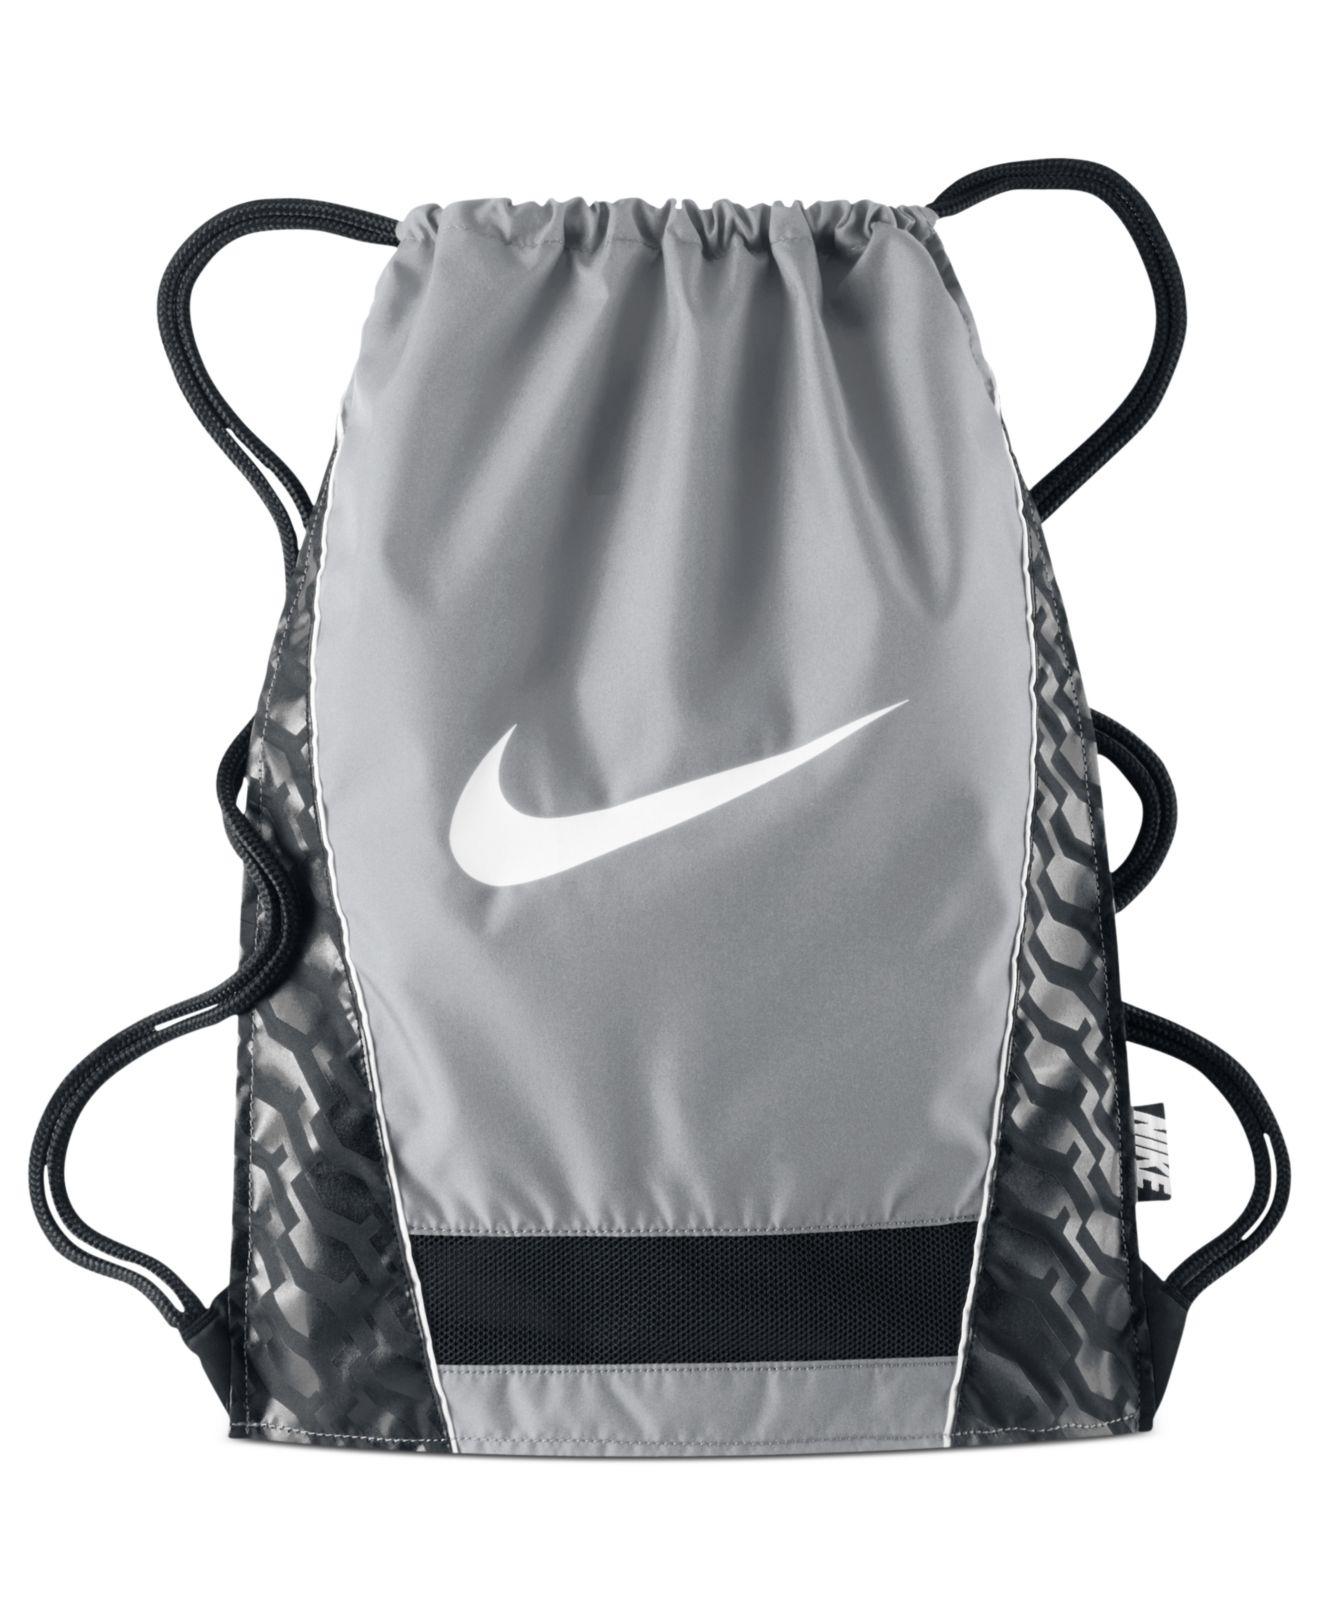 91fd44610c Nike Bags Gym Sack